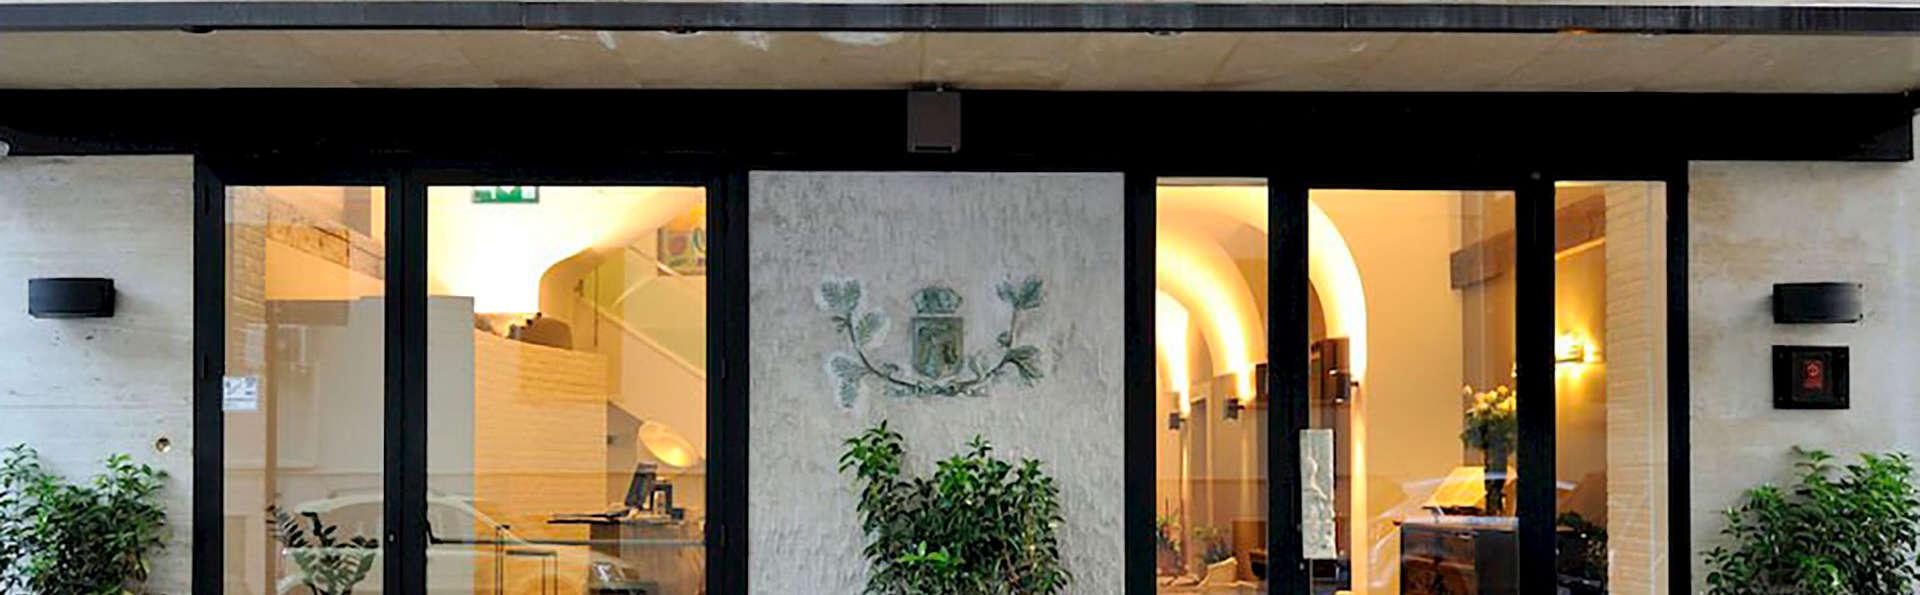 Hotel Principe di Villafranca - EDIT_FRONT_02.jpg